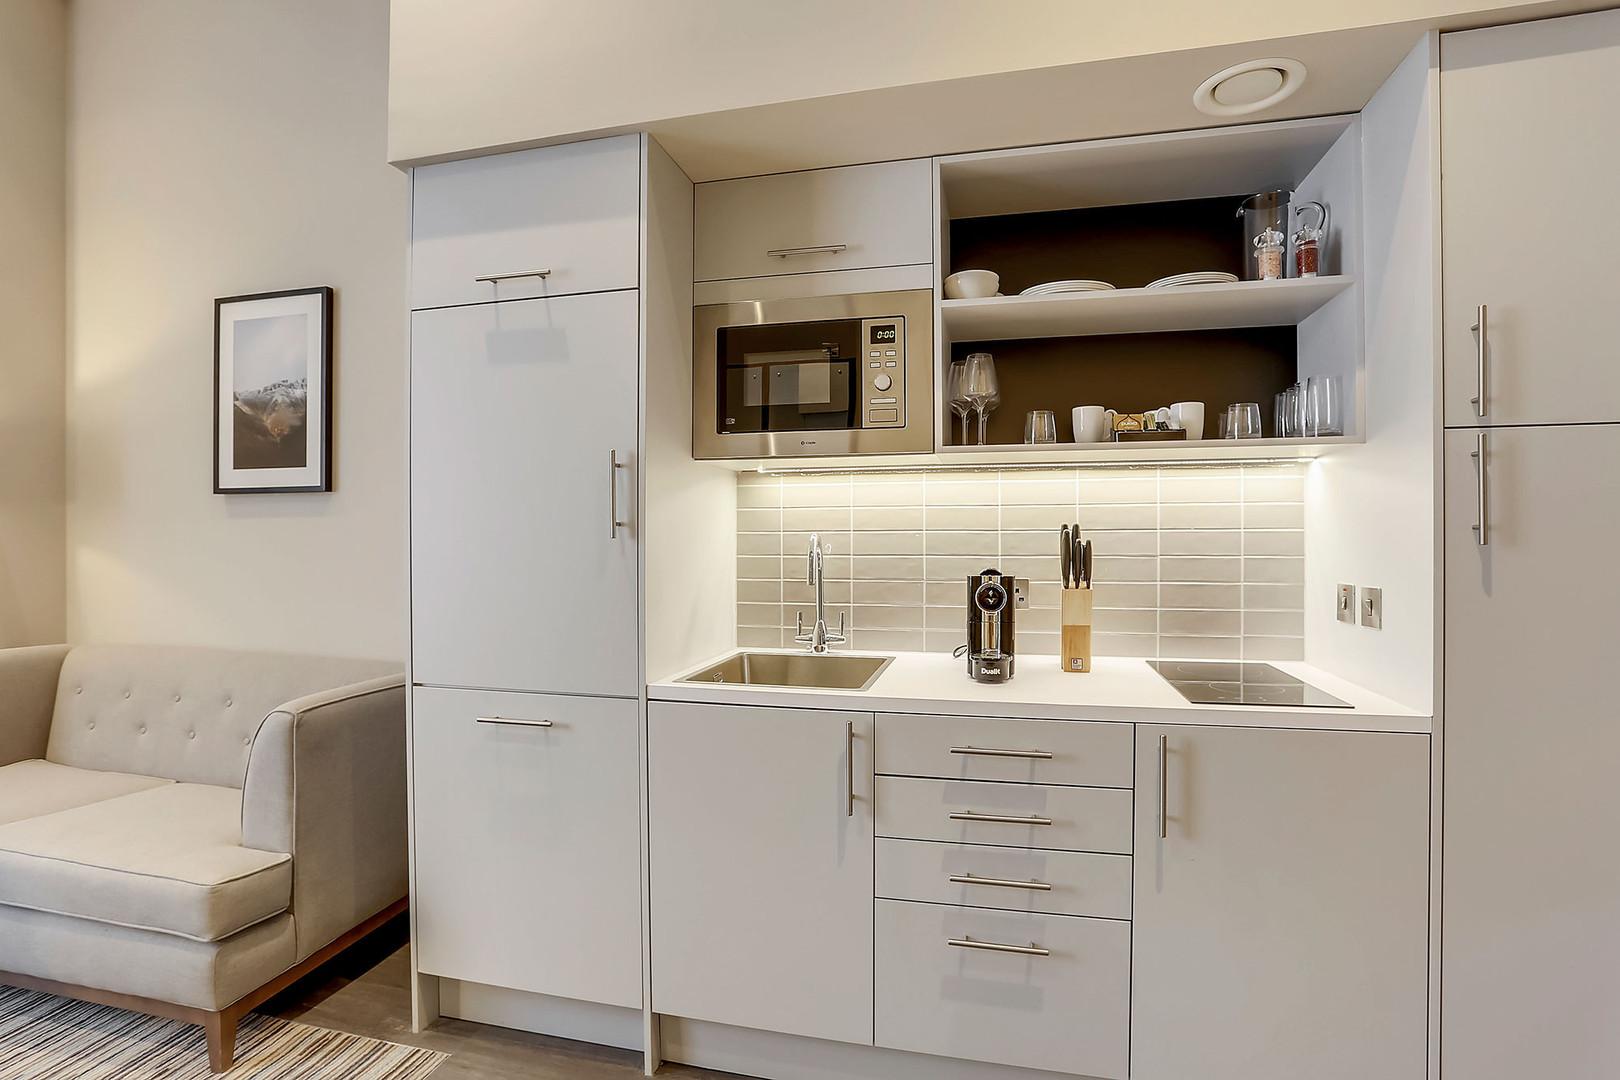 Unit-2-Kitchen-MG3001-(1).jpg